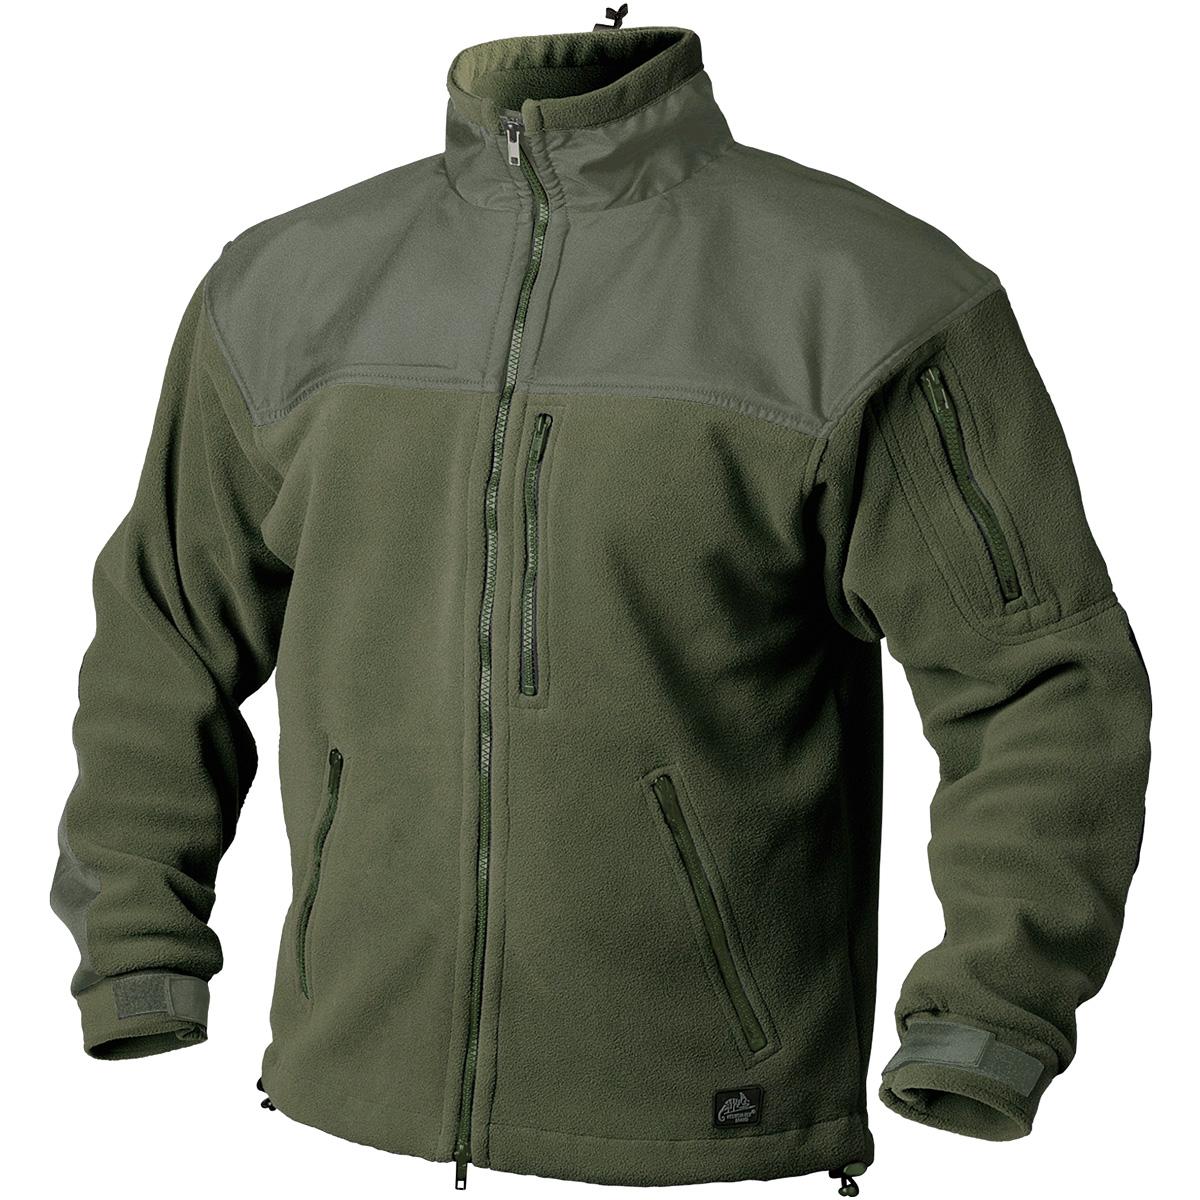 Ebay Hunting Clothes Uk